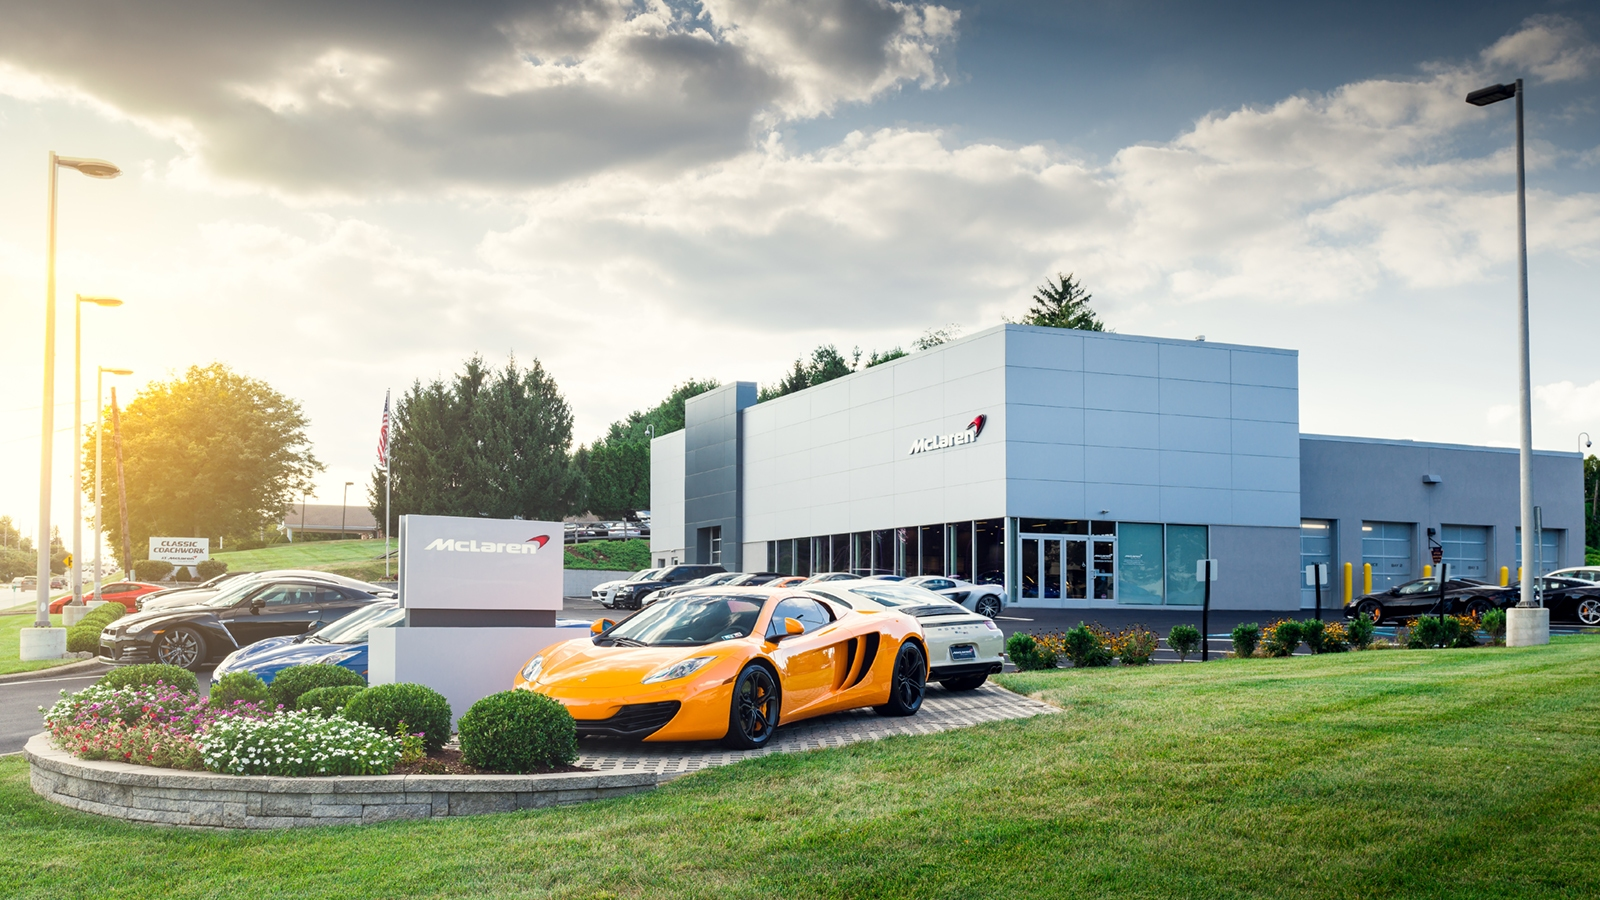 McLaren, West Chester PA